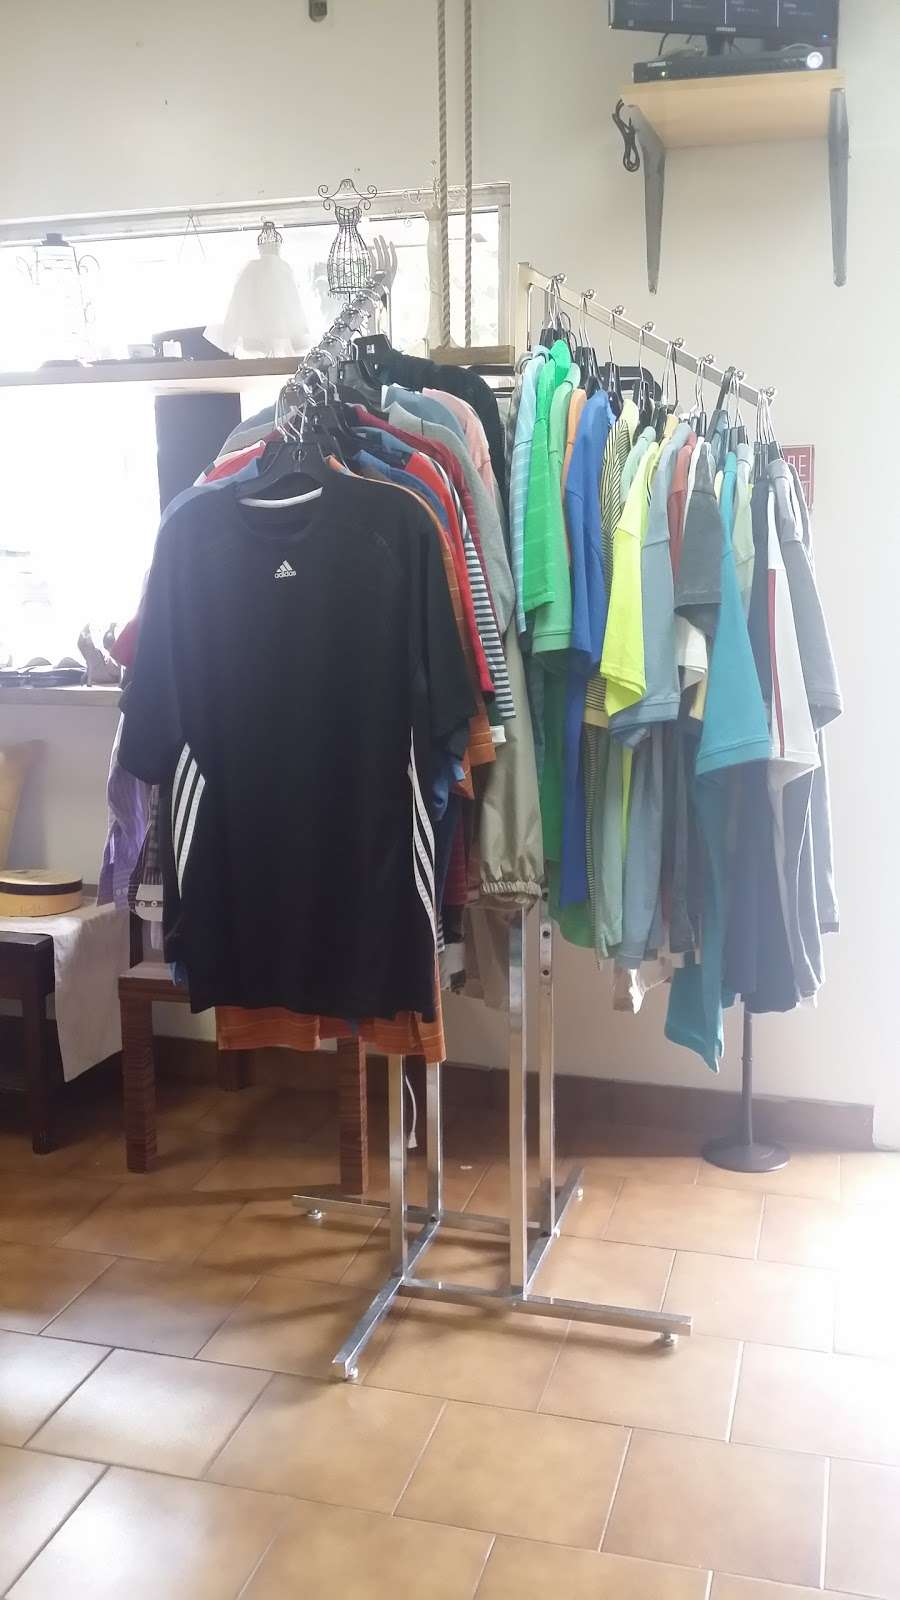 Glow Thrift Shop Store - clothing store  | Photo 6 of 10 | Address: 561 Palisade Ave, Jersey City, NJ 07307, USA | Phone: (646) 399-7397